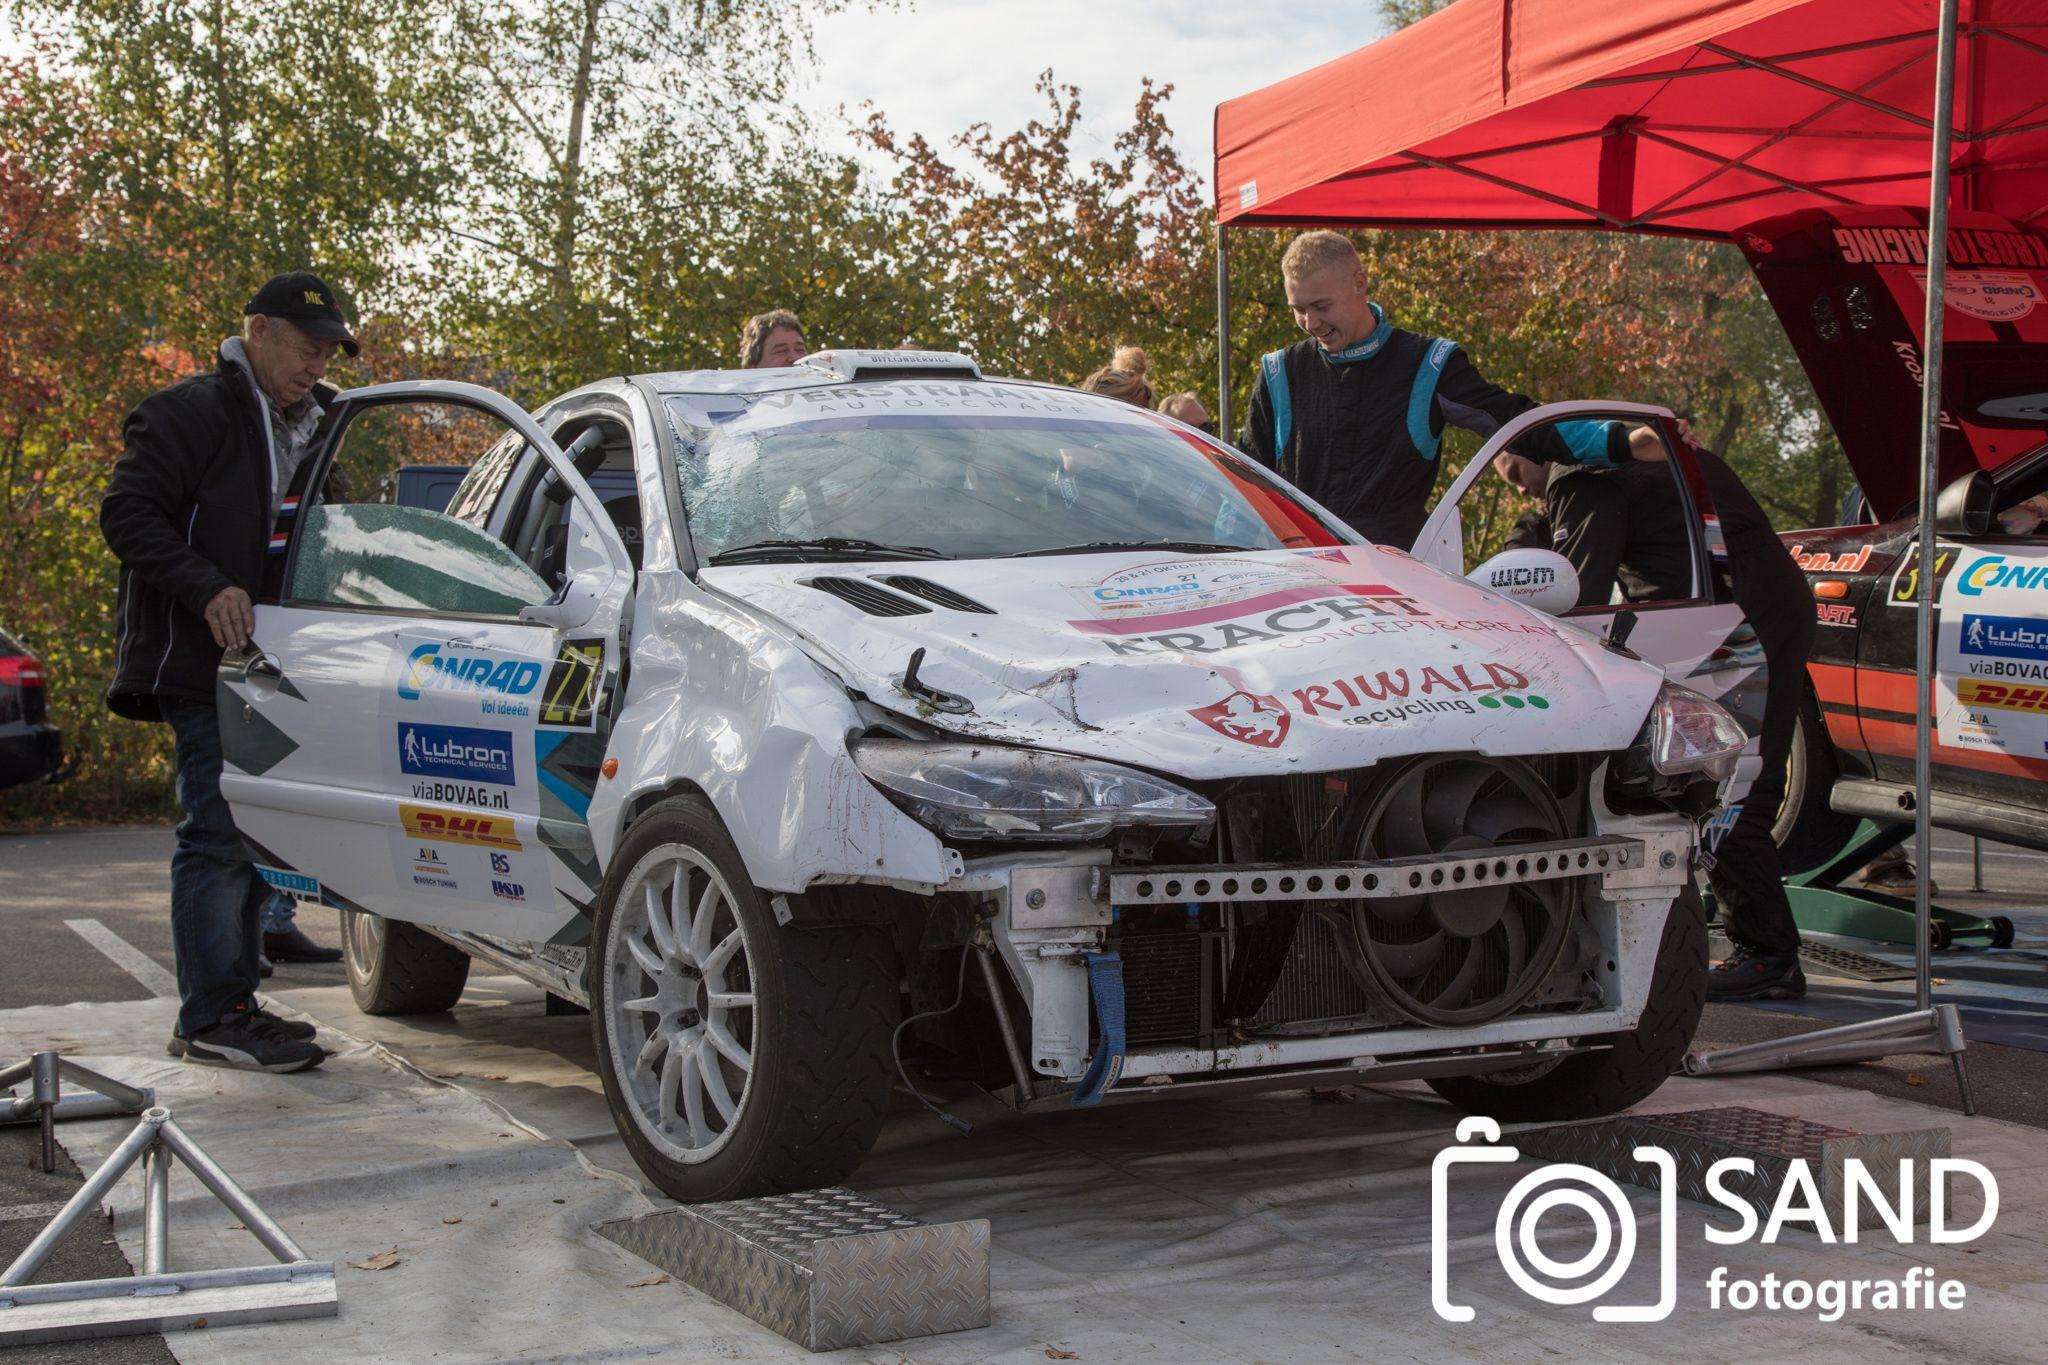 Conrad Euregio Rally Hengelo 2018 mmv Sand Fotografie